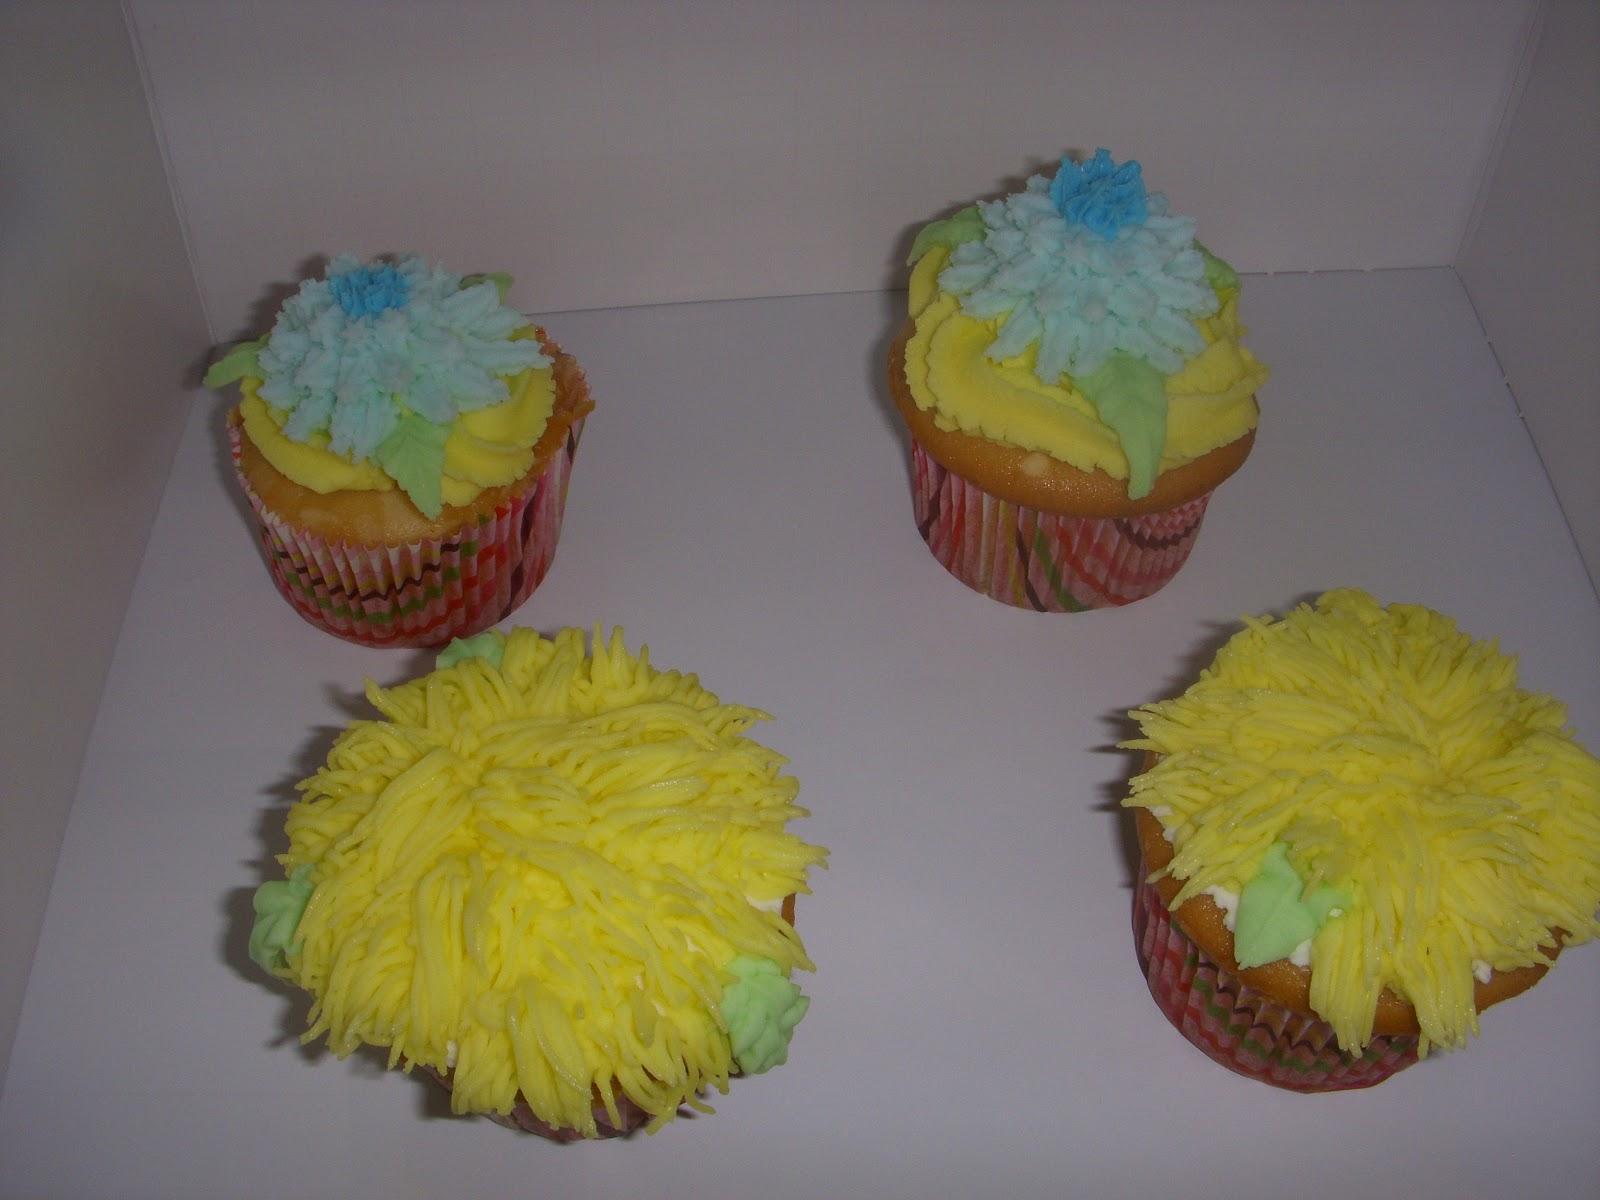 Cake Decorating Classes Usa : [basic cake decoration] - 28 images - prayers hugs diapers ...